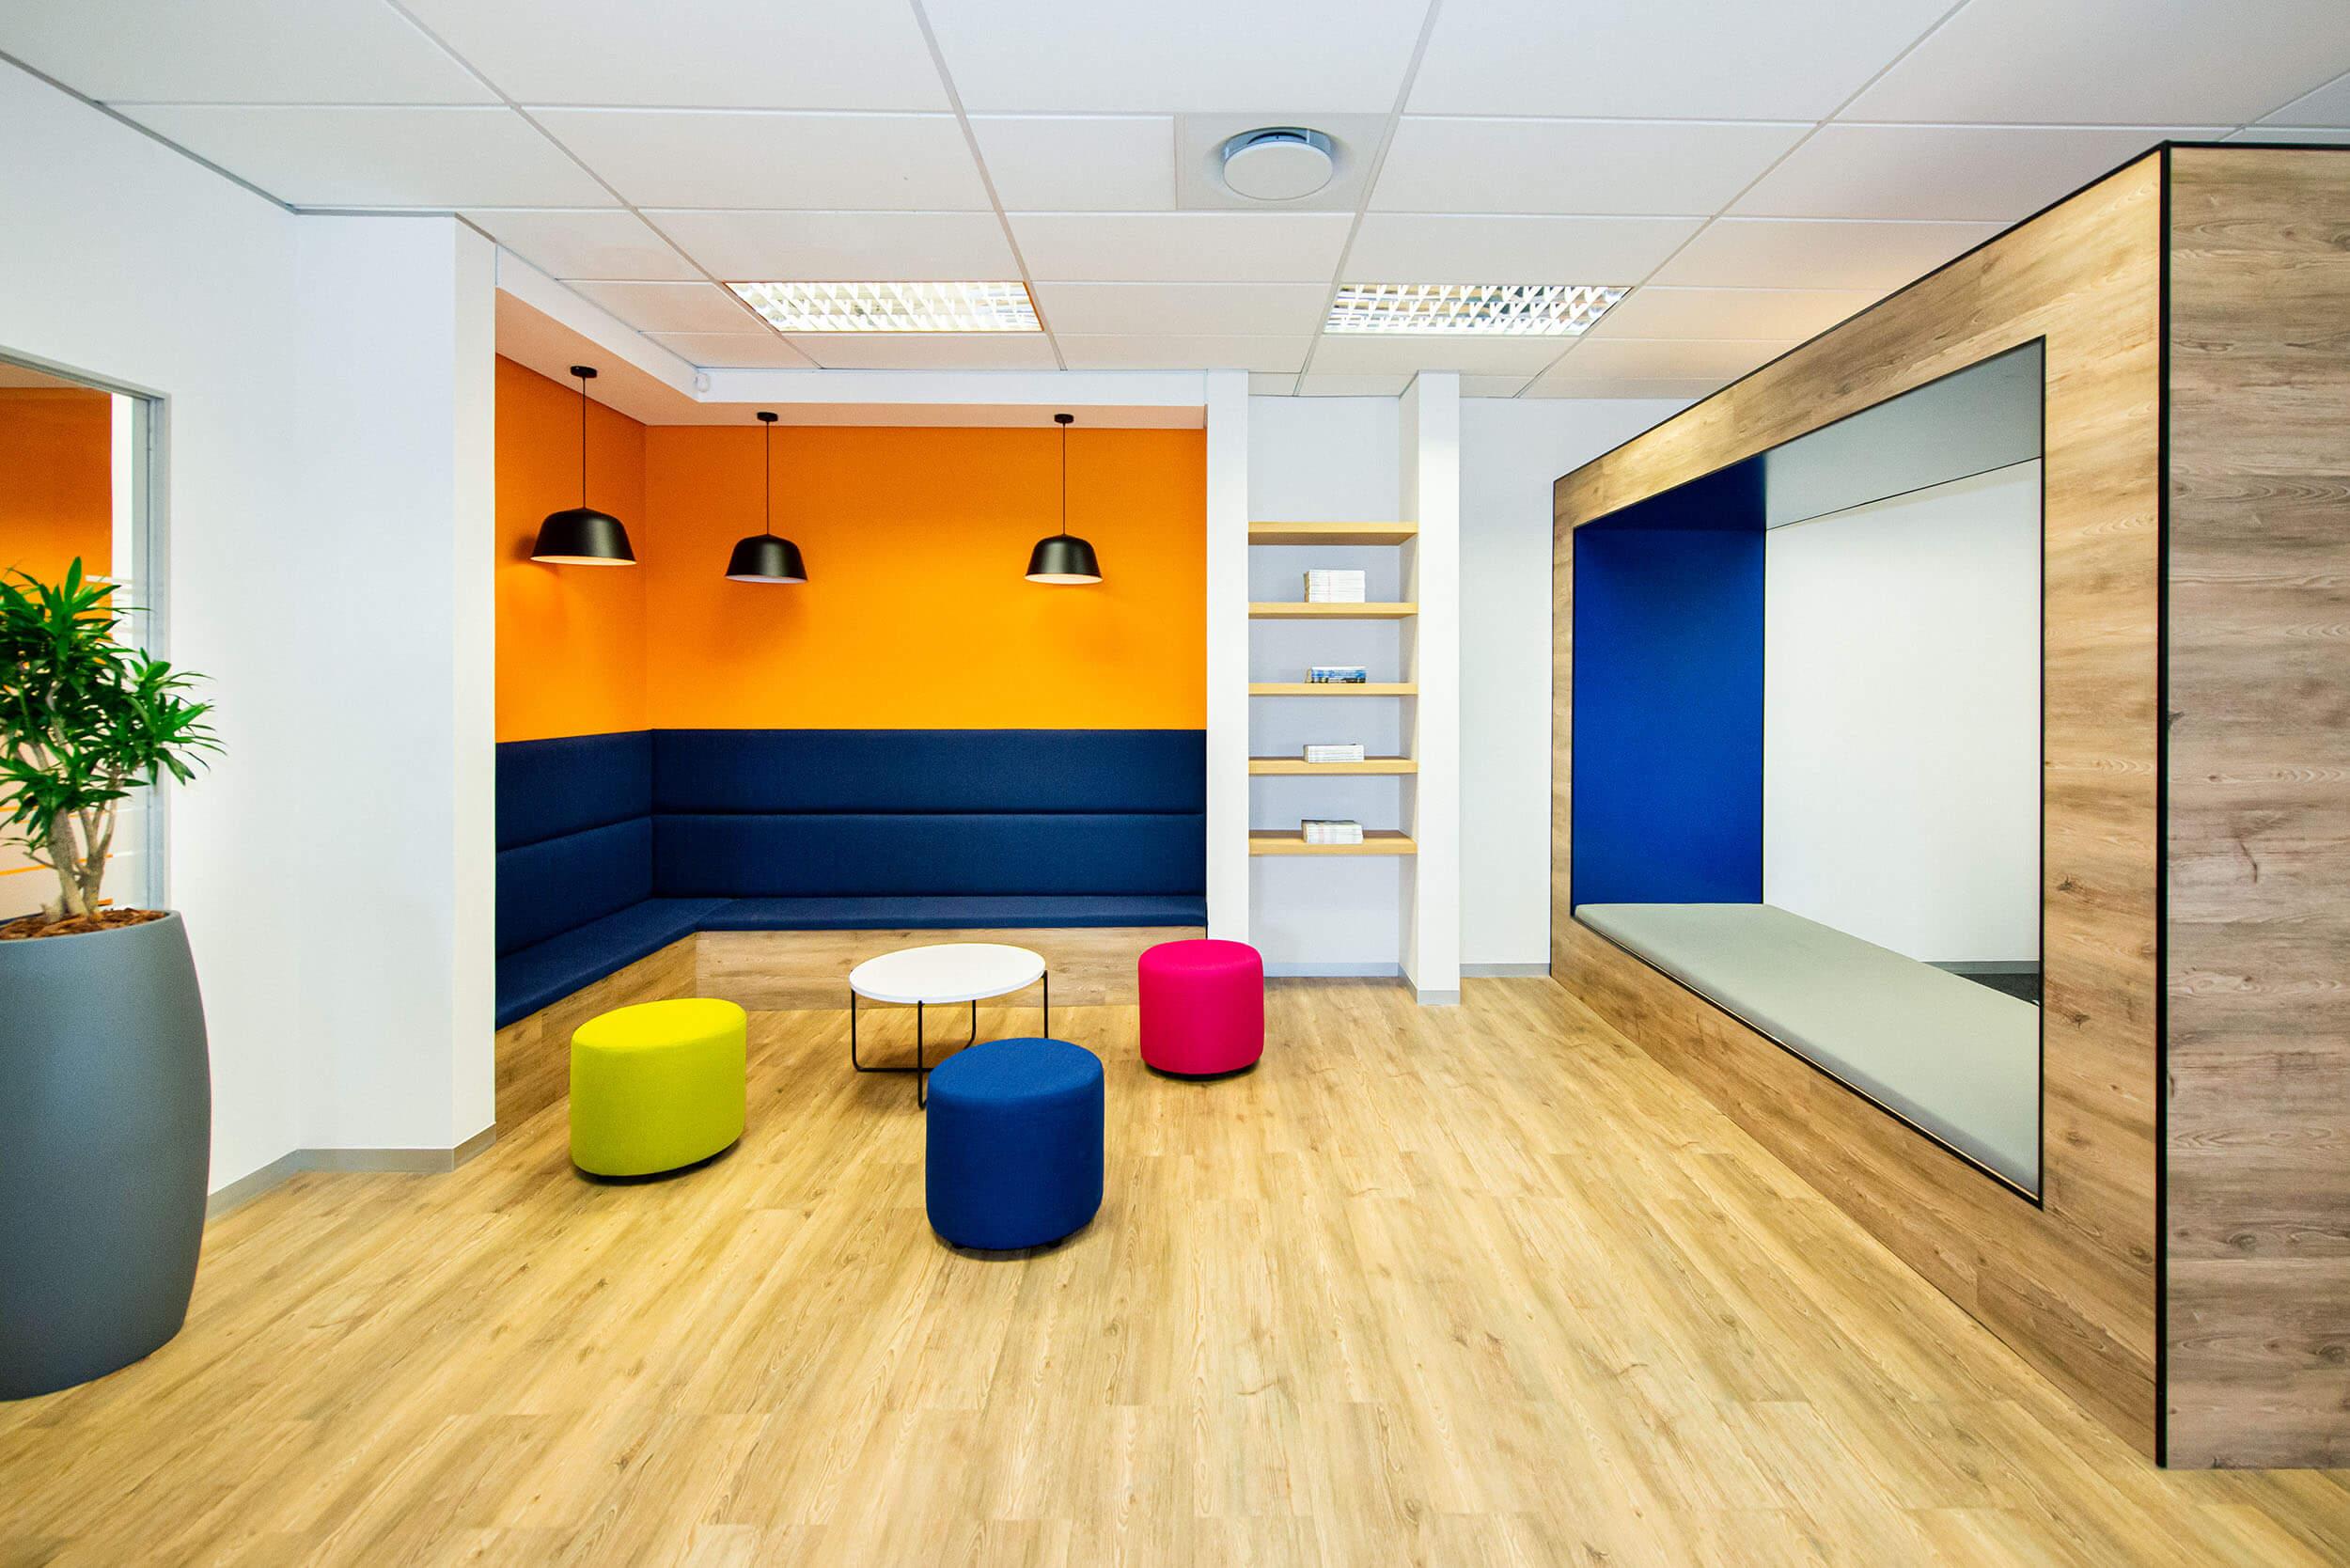 ITL - Turnkey Interiors - Corporate Interior Design and Build